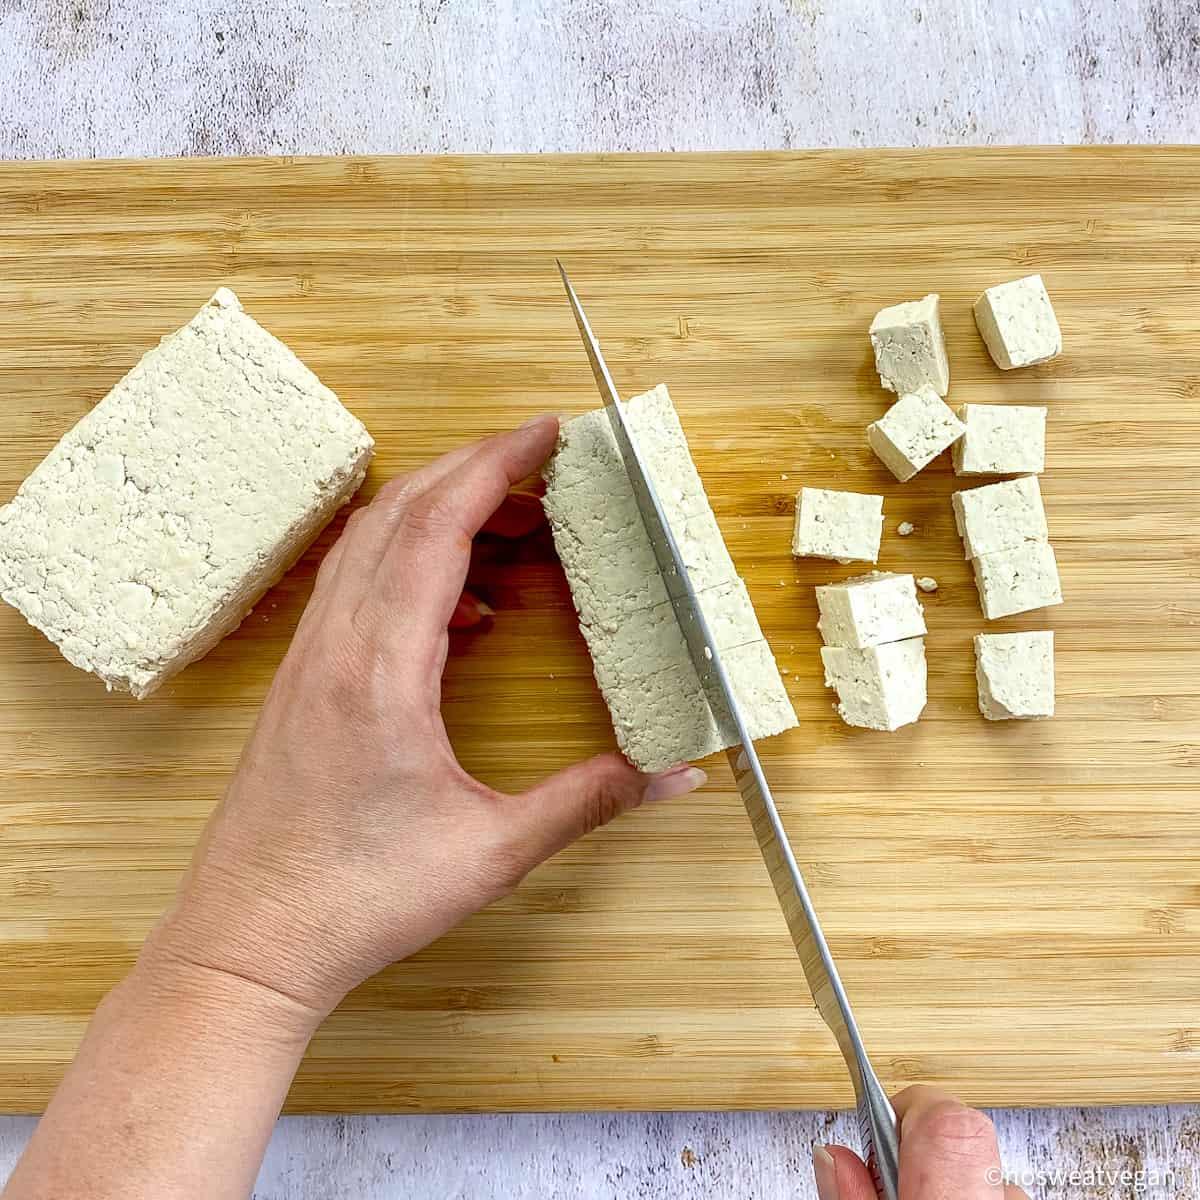 Hands cubing tofu on cutting board.